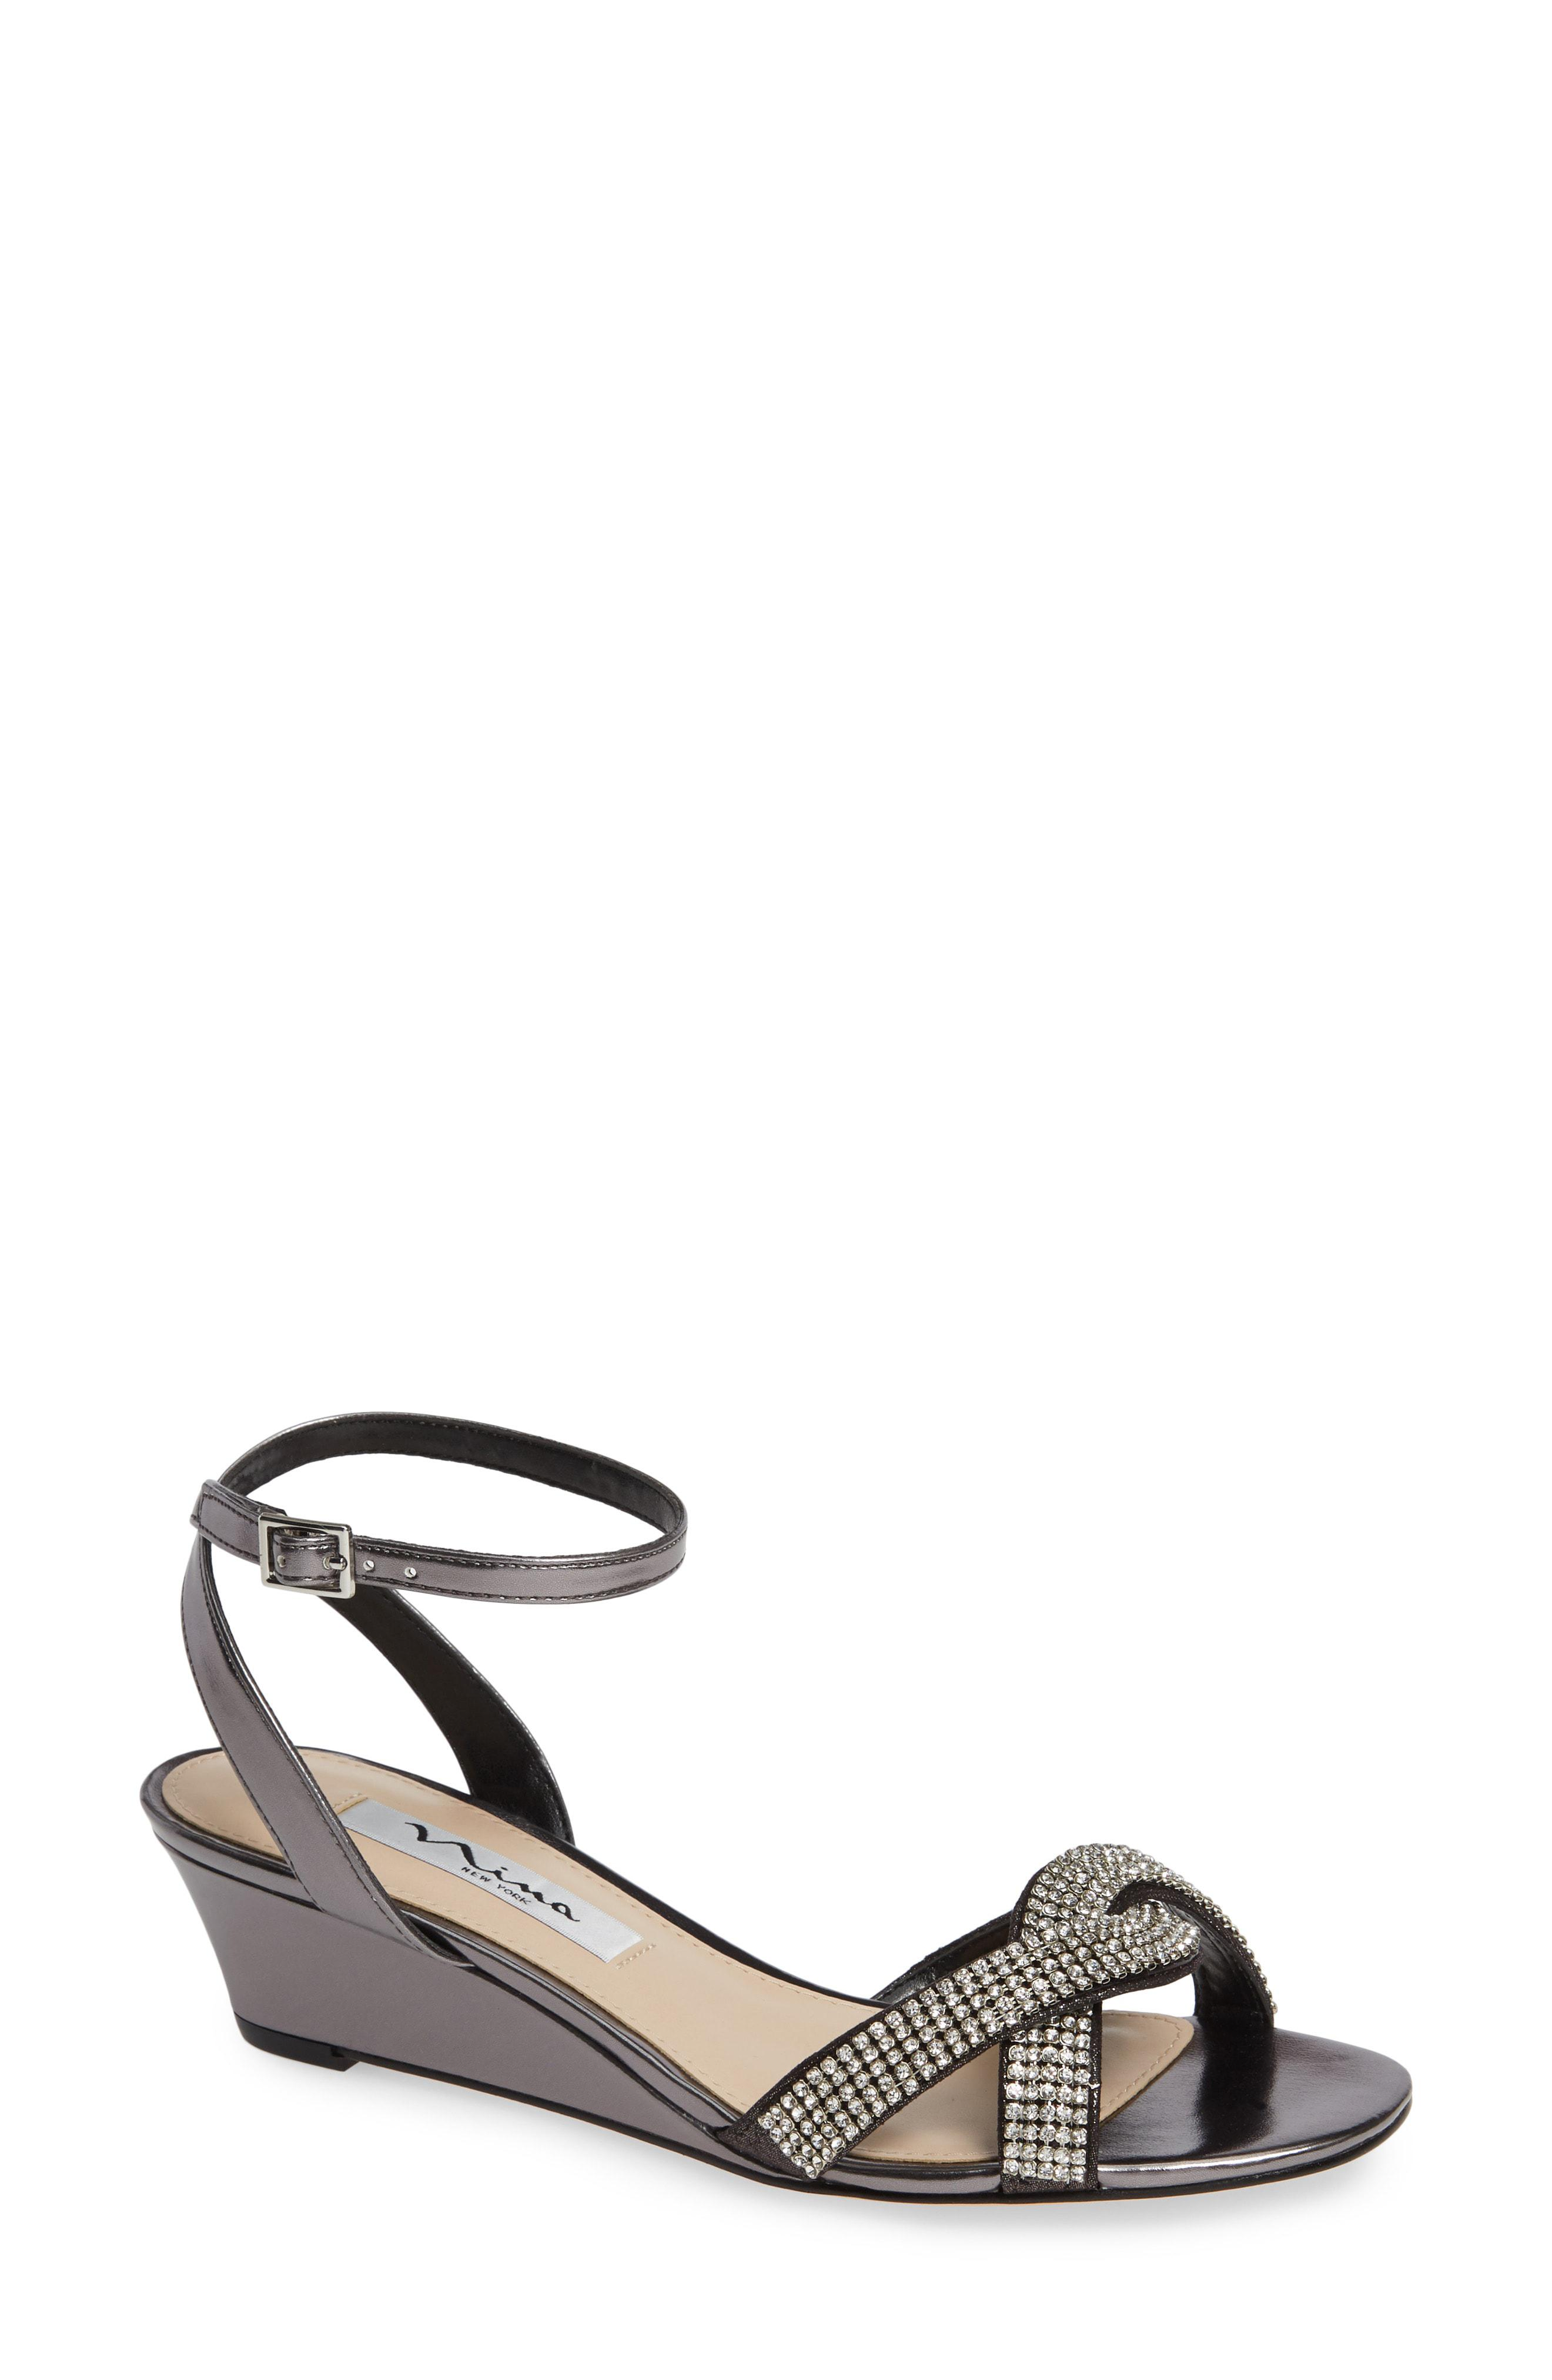 866d239122 Lyst - Nina Florina Crystal Embellished Wedge Sandal in Metallic